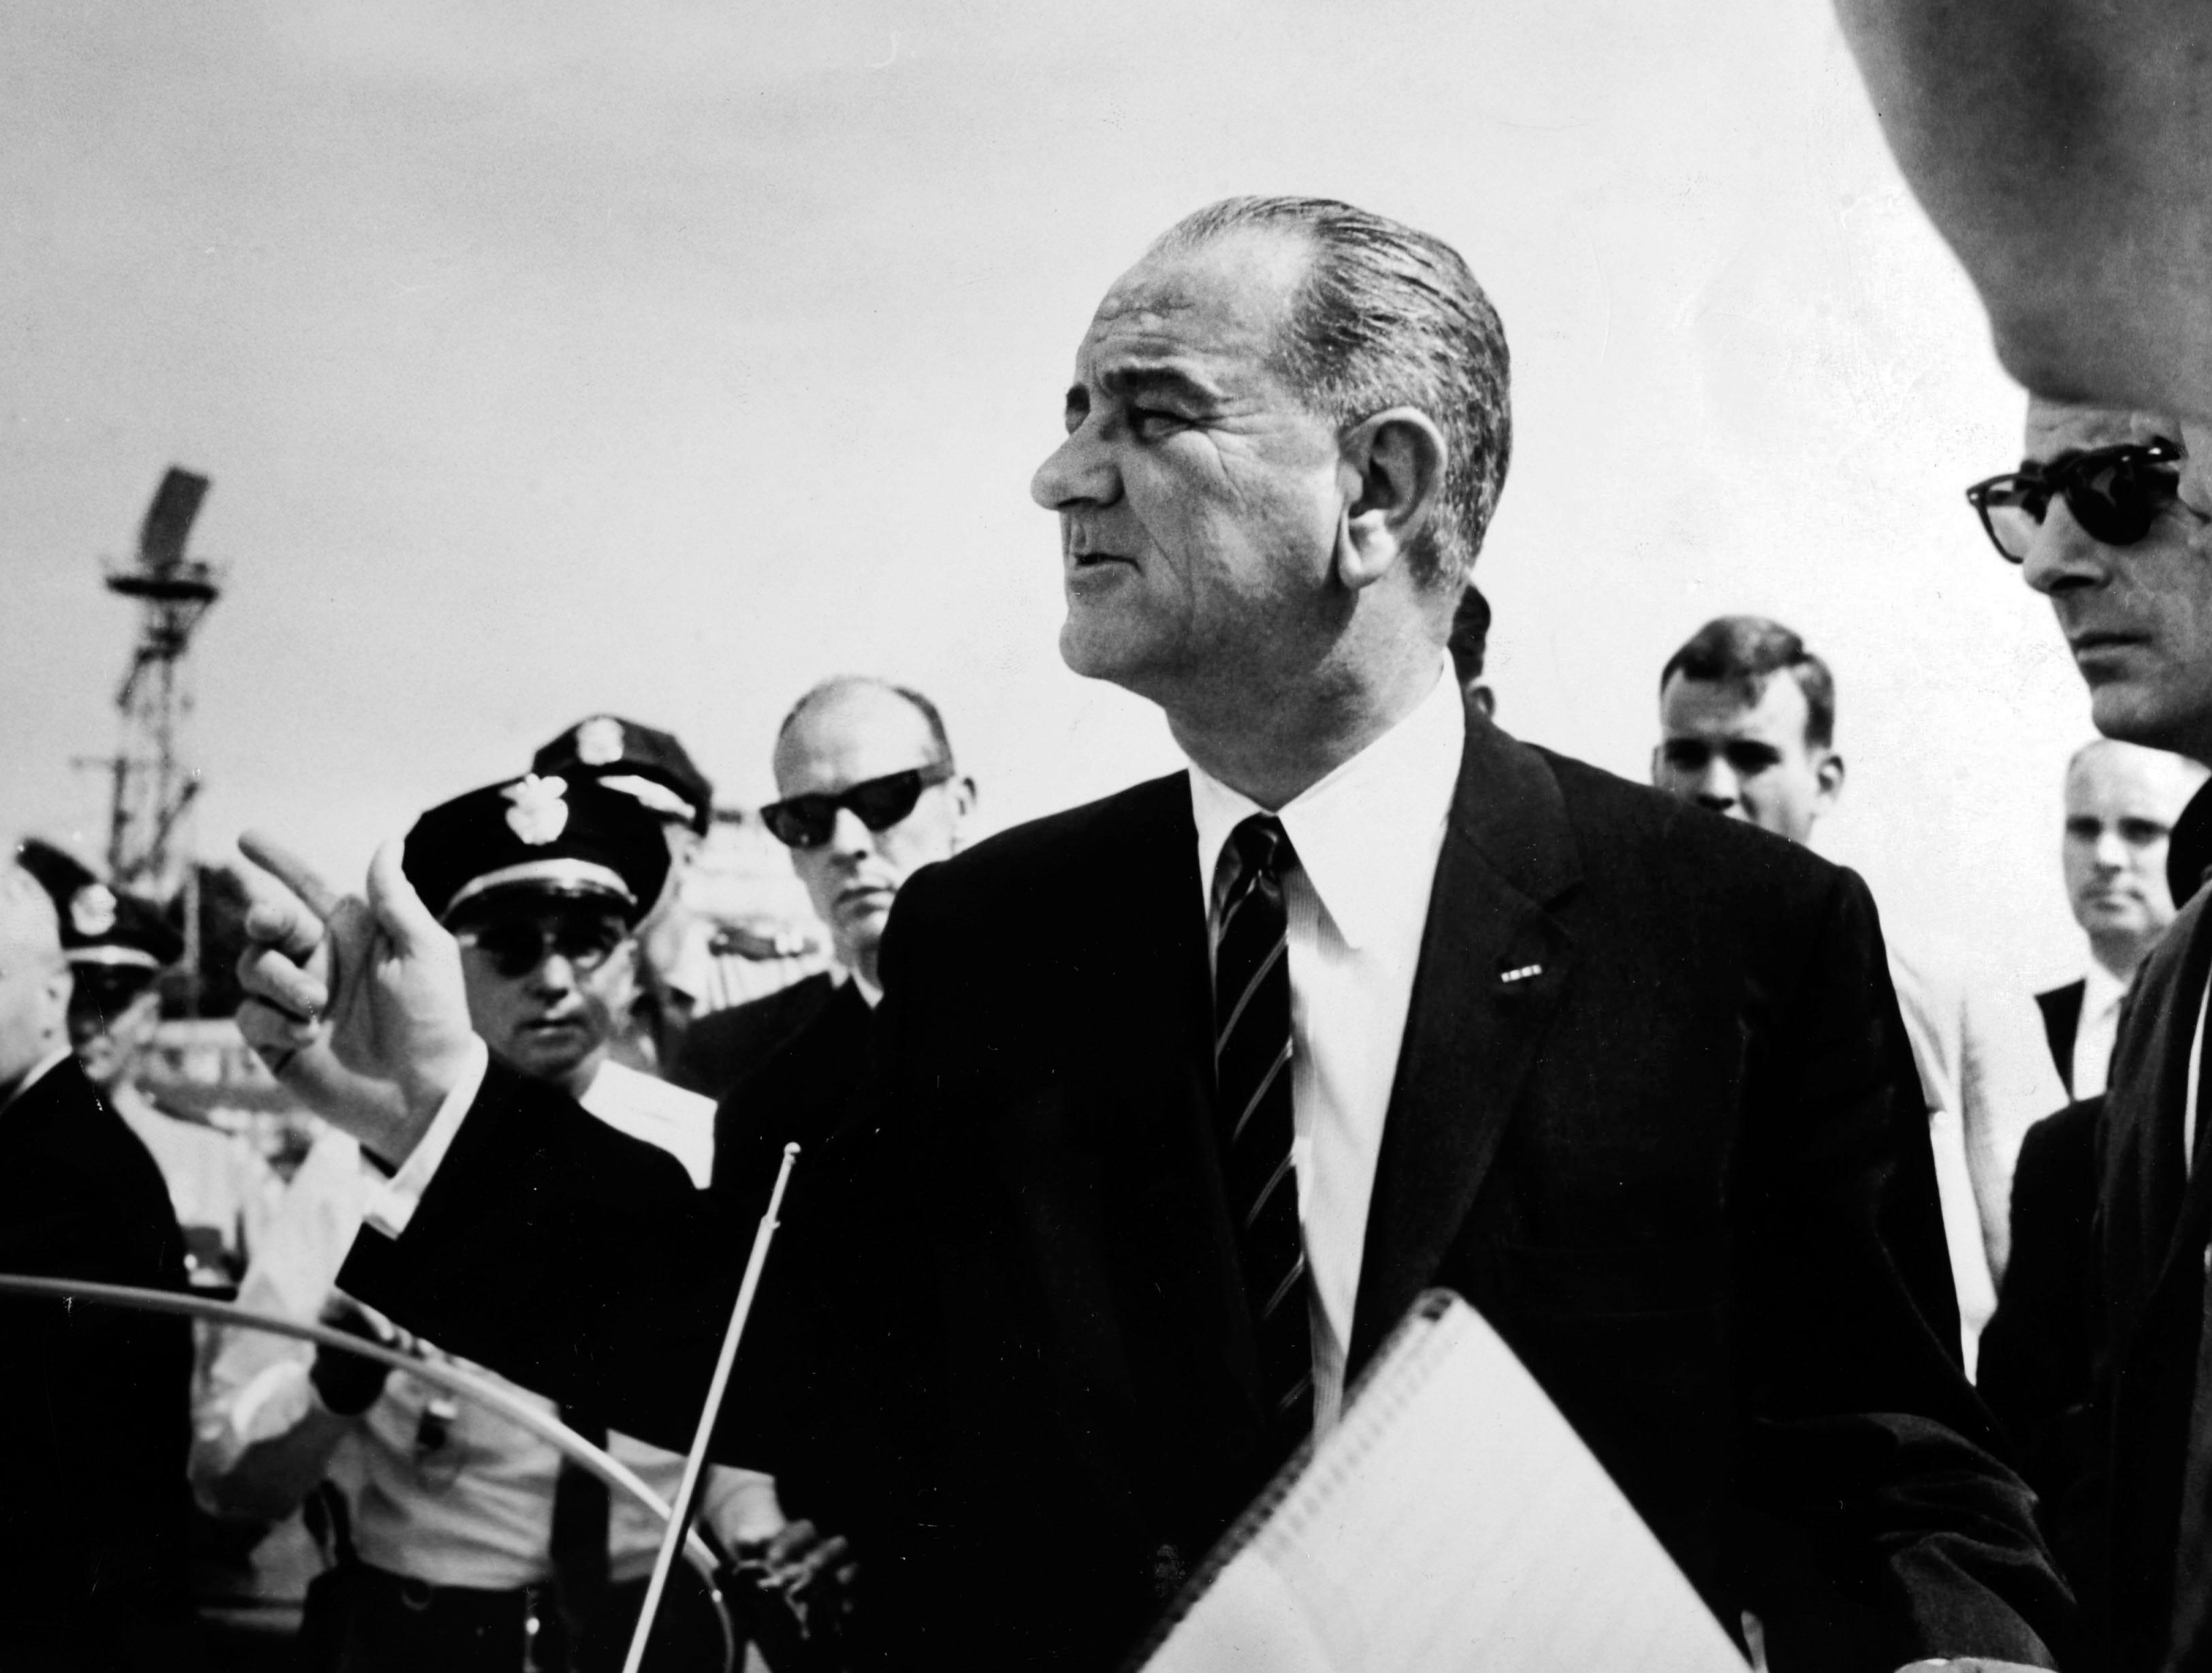 In a May 7, 1964 photograph, President Lyndon B. Johnson arrives at Municipal Airport.